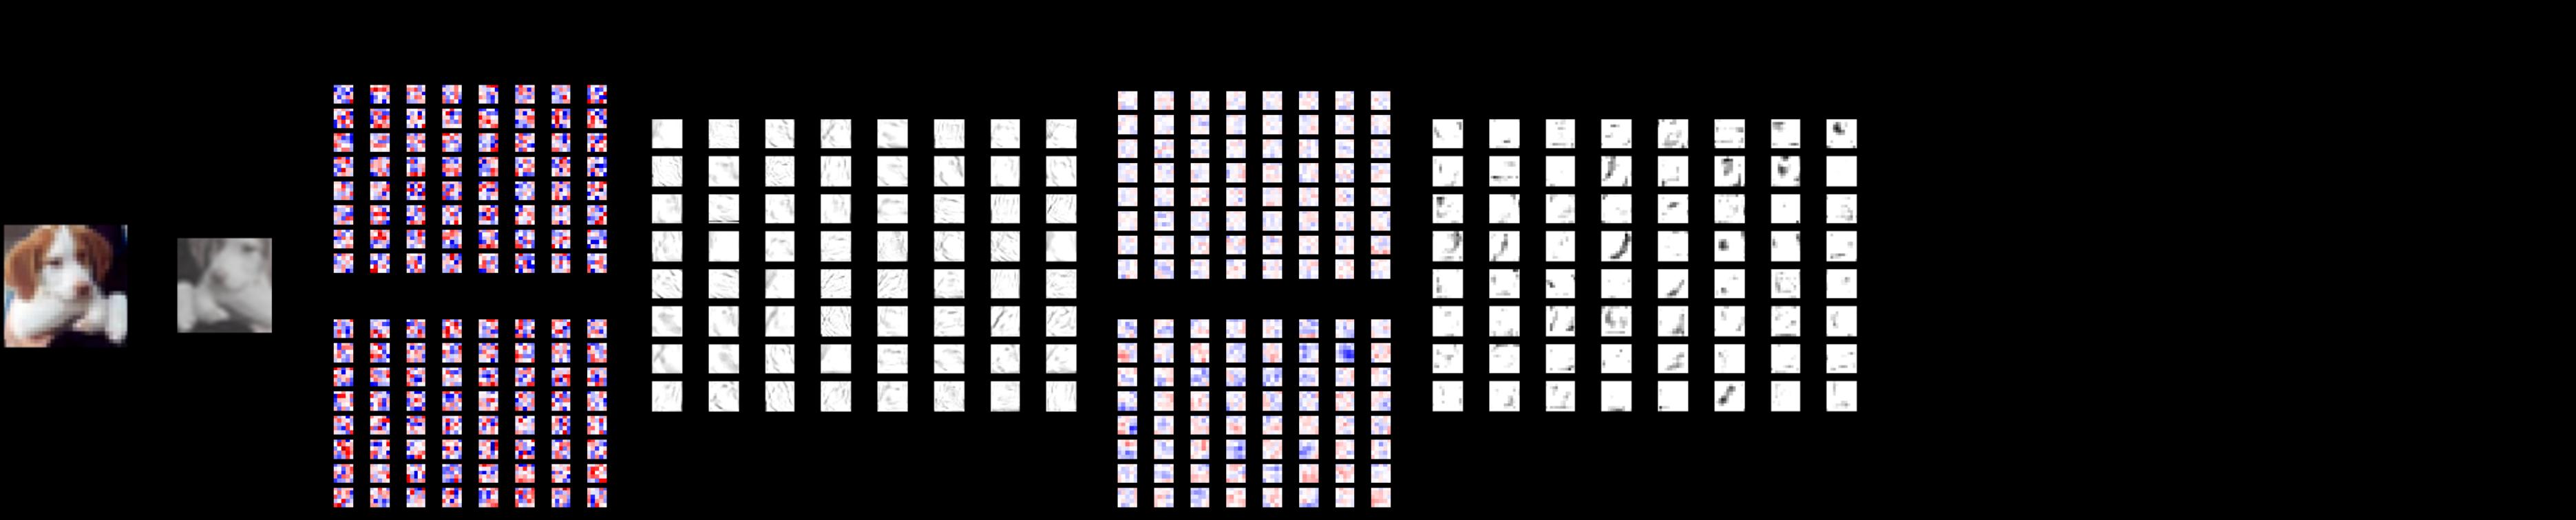 cifar-10结构